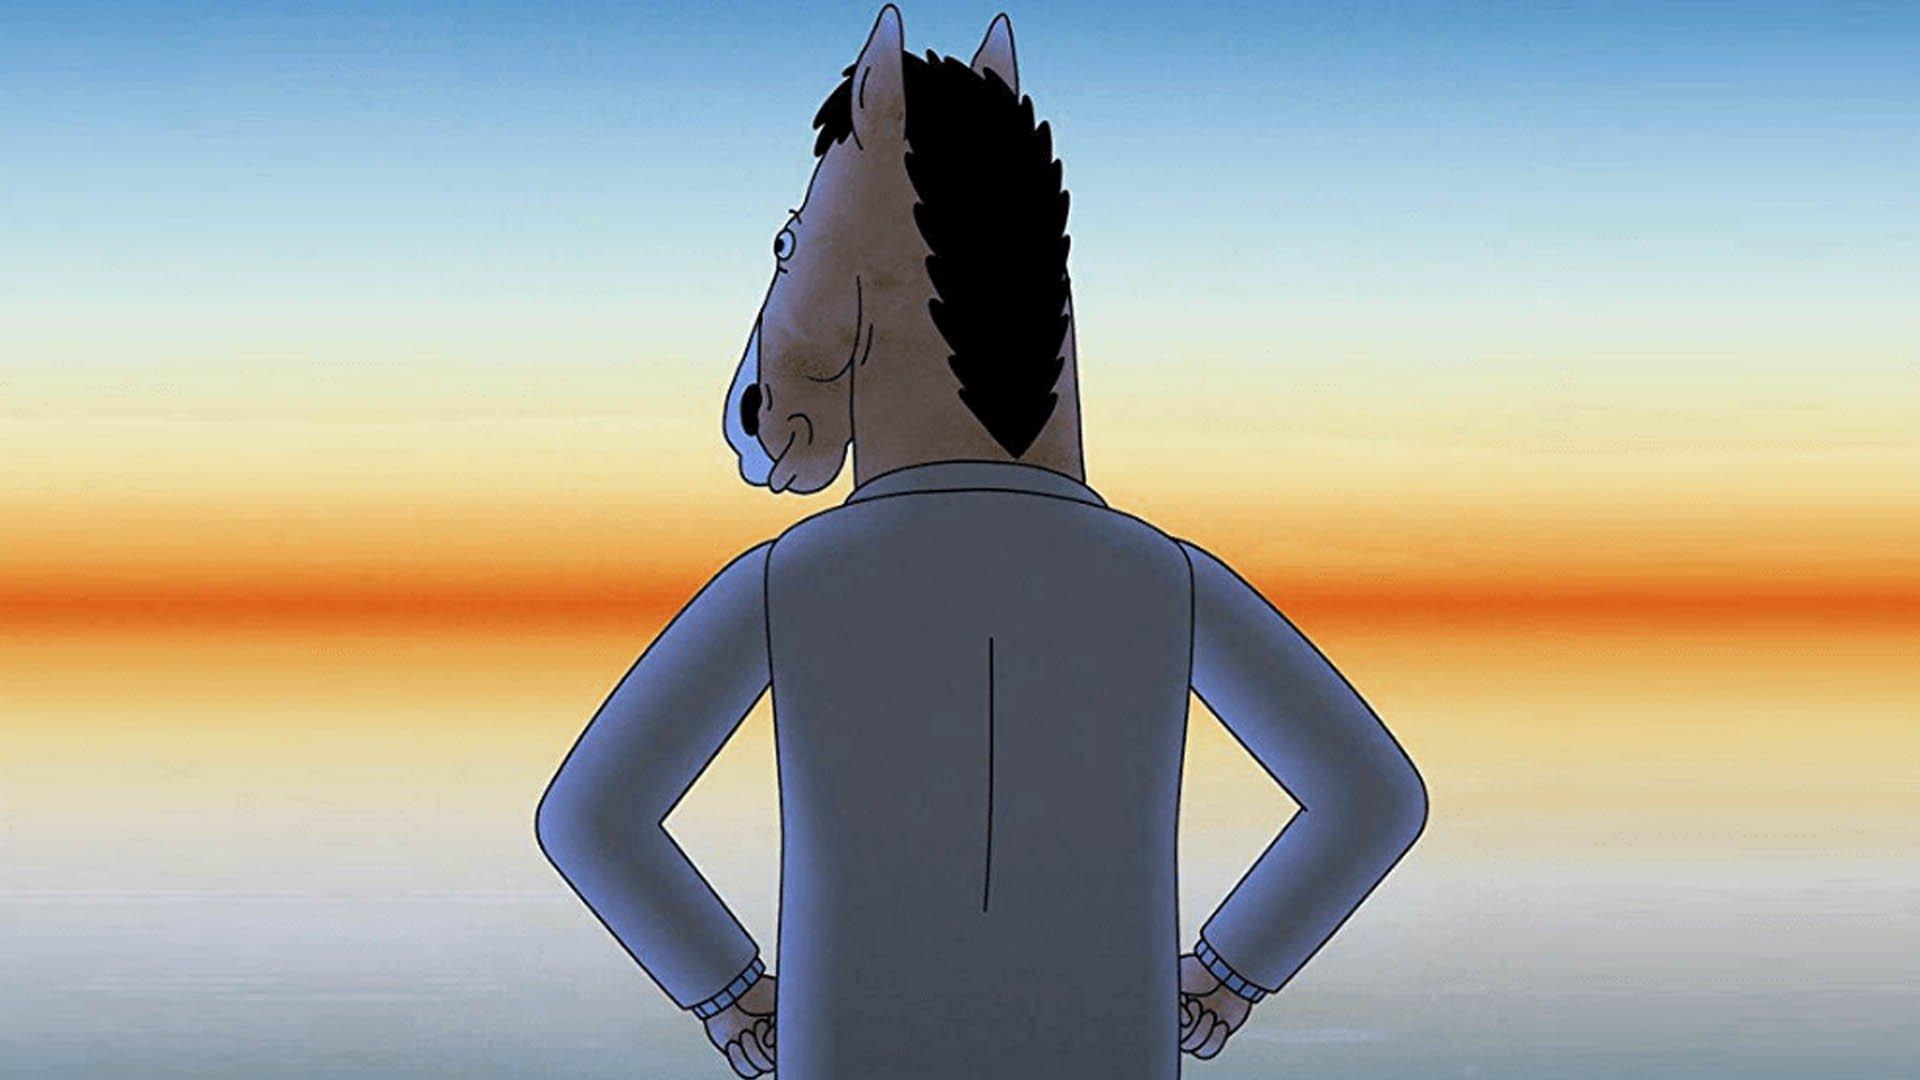 Il 31 gennaio esce Bojack Horseman 6 su Netflix